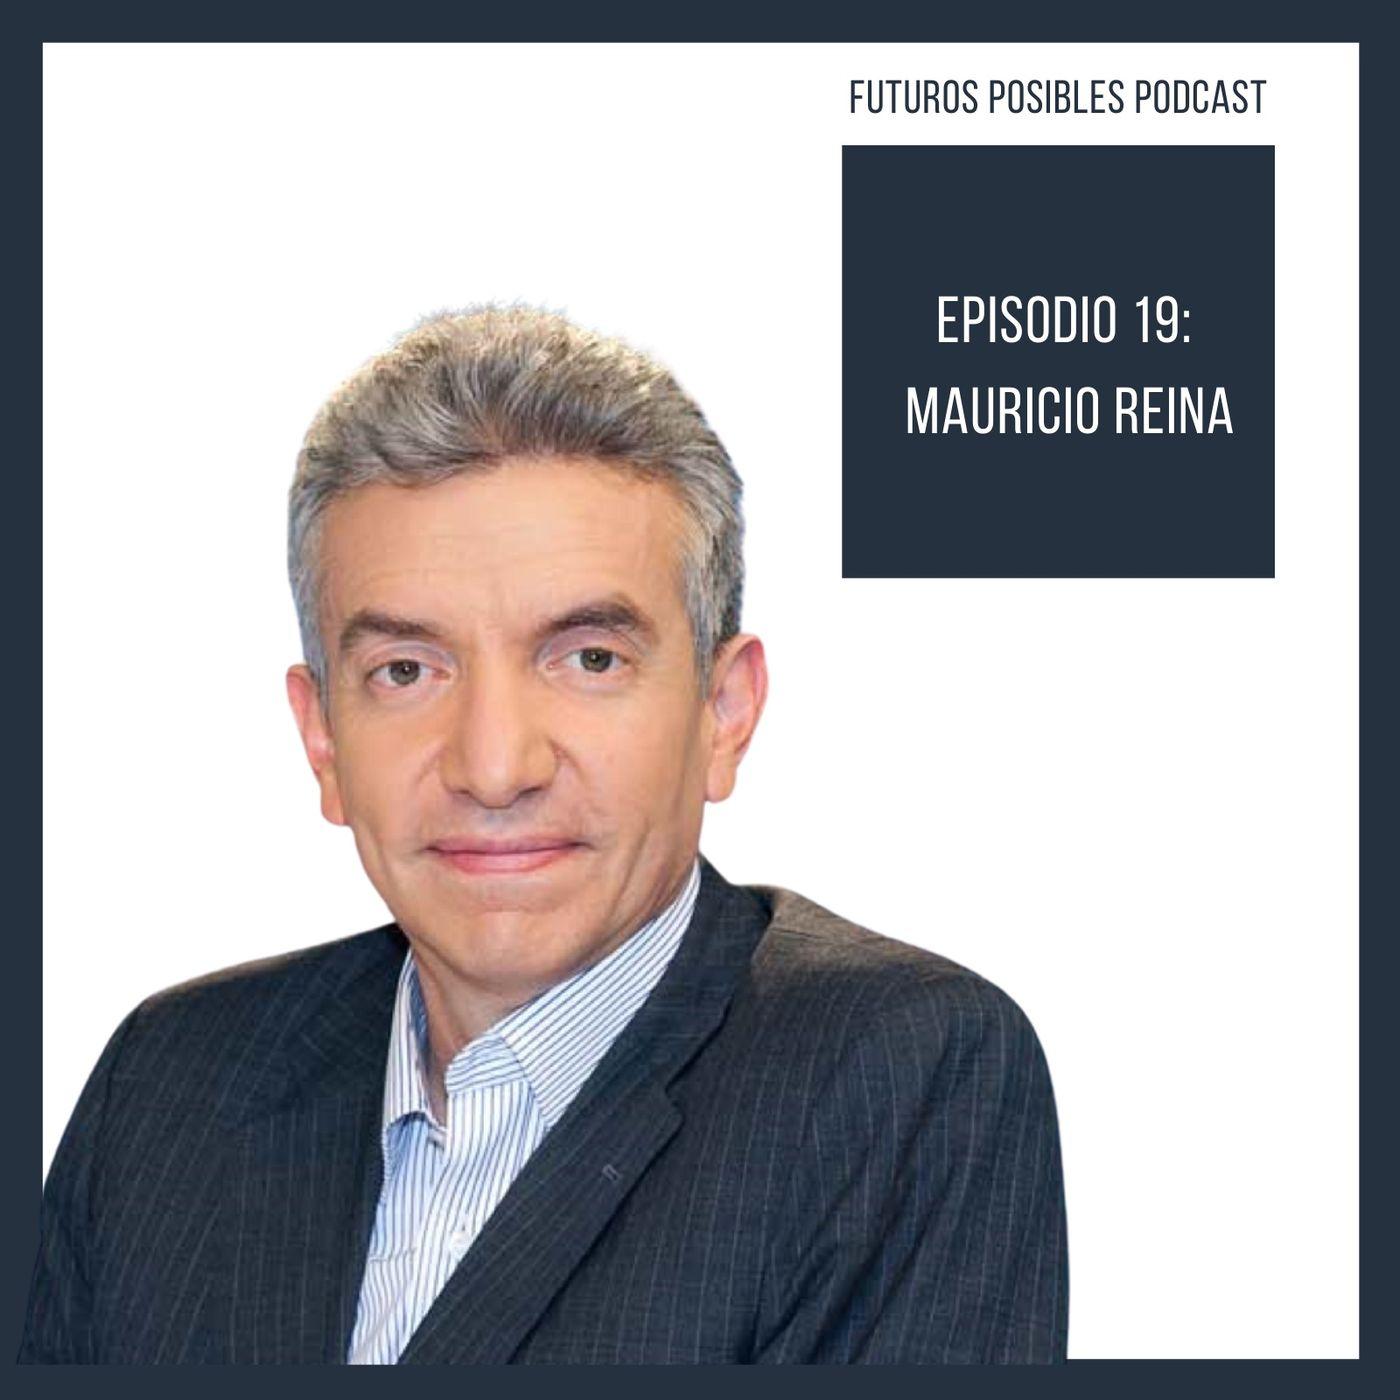 Ep.19: Educación para la innovación, con Mauricio Reina